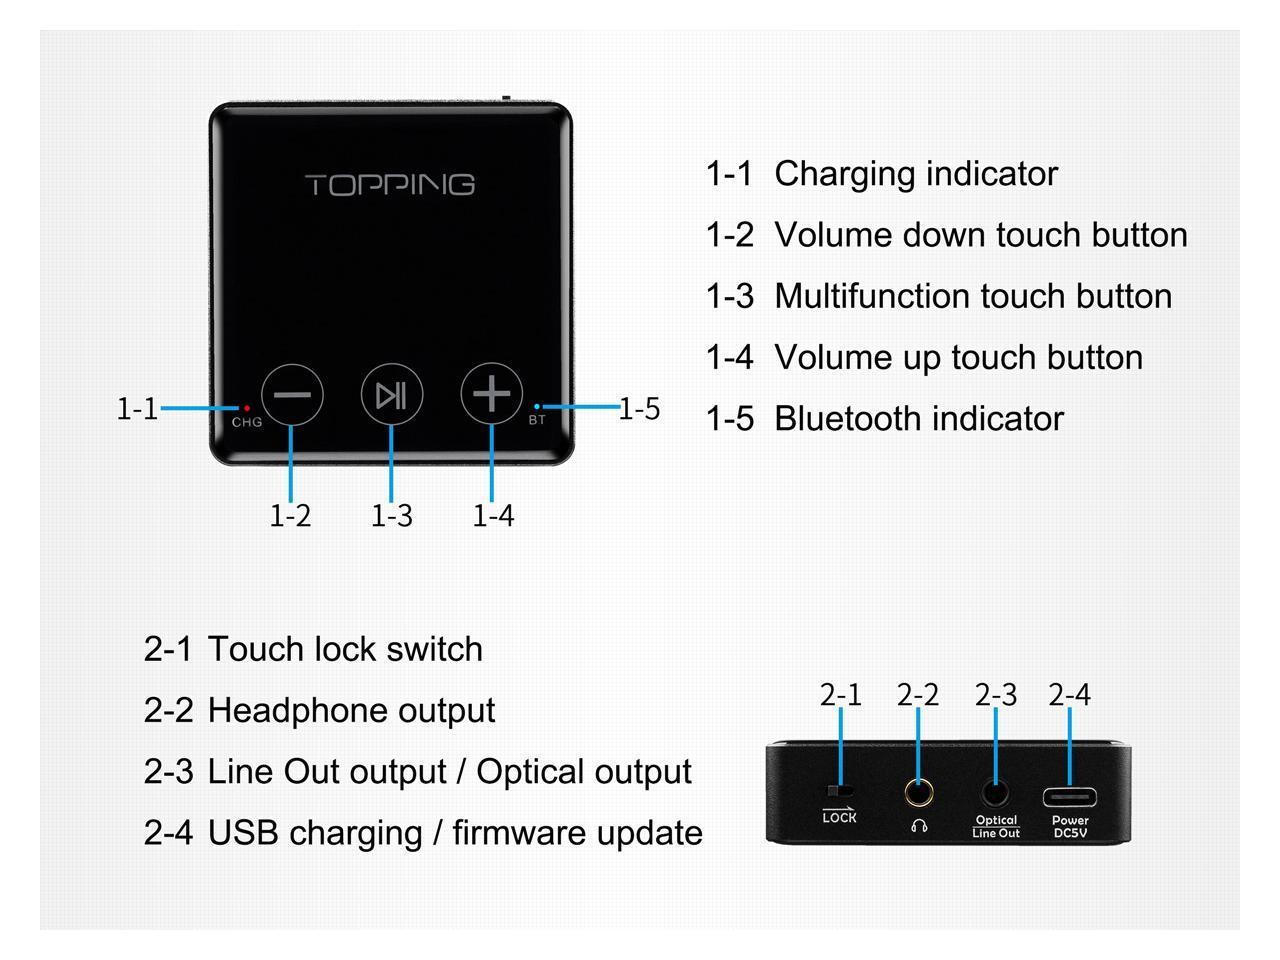 Topping BC3 Heaphone Amp Wireless Bluetooth5.0 LDAC 24bit//96kHz CSR8675 Receiver Hi-Res Audio with AAC//SBC//aptX HD//aptX Black